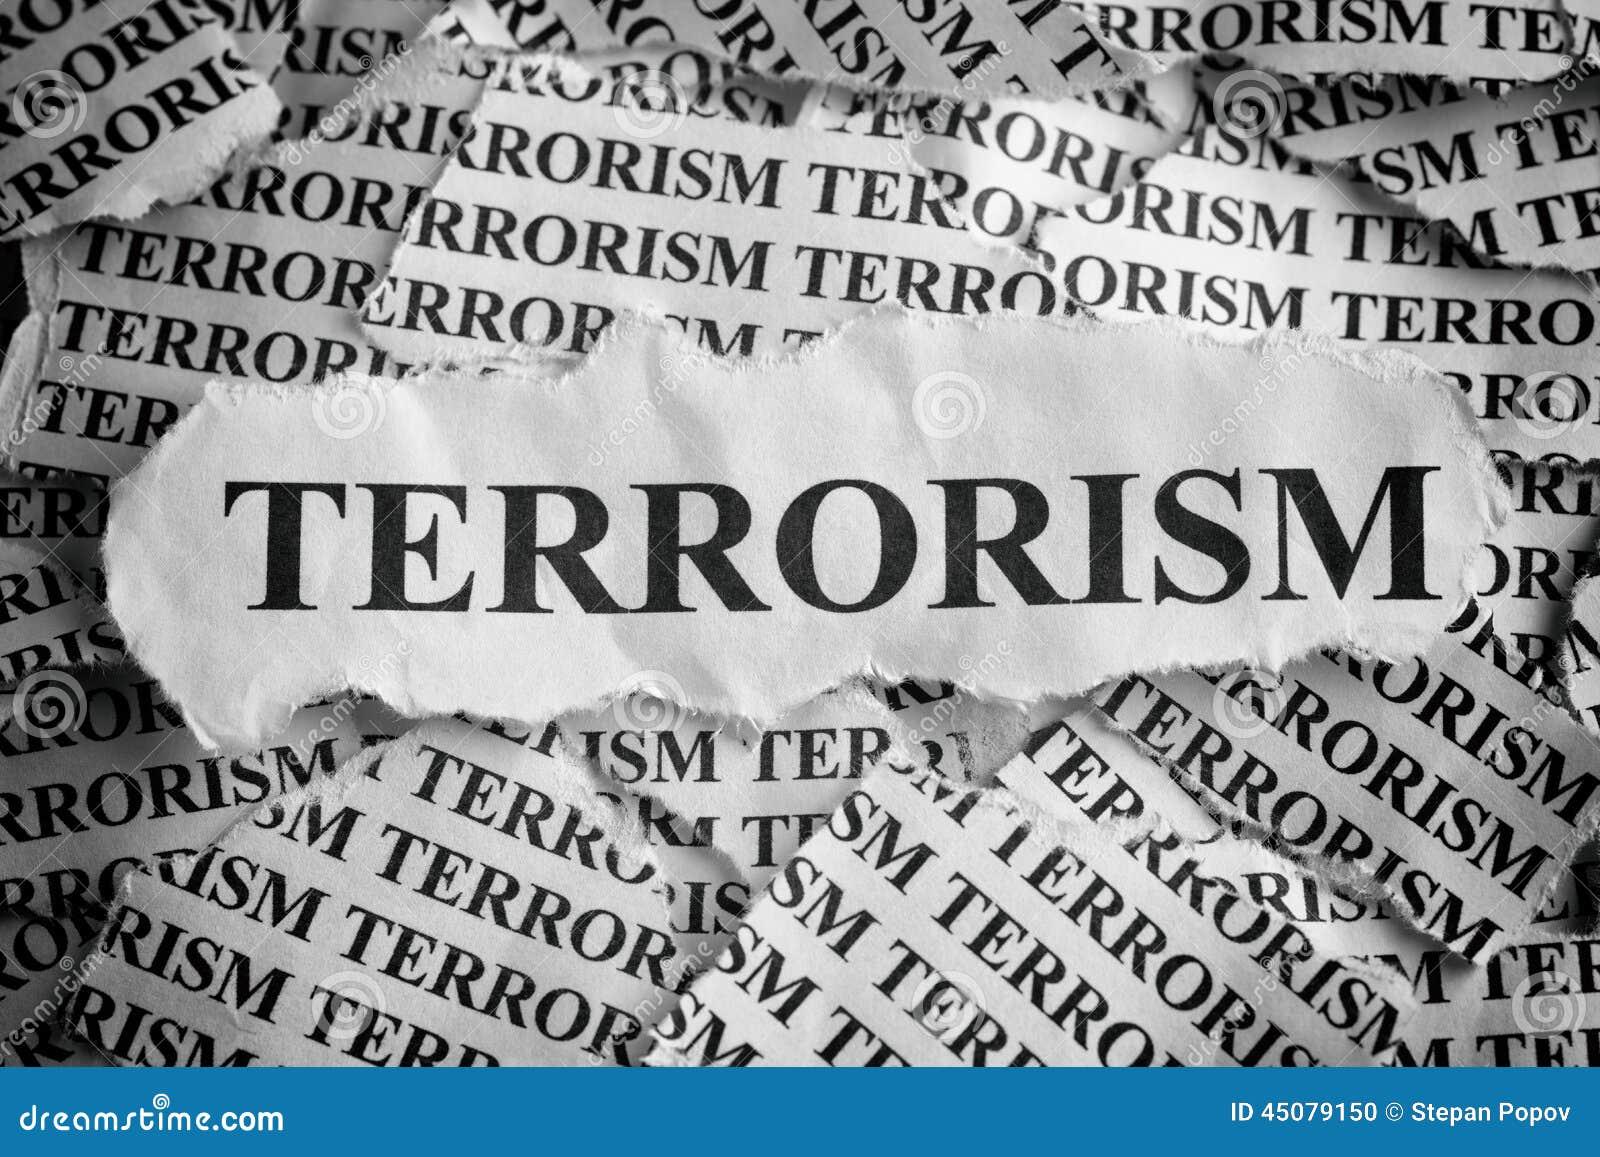 Essay Writing Terrorism Pakistan Writing The Essay Essay Writing Terrorism Pakistan